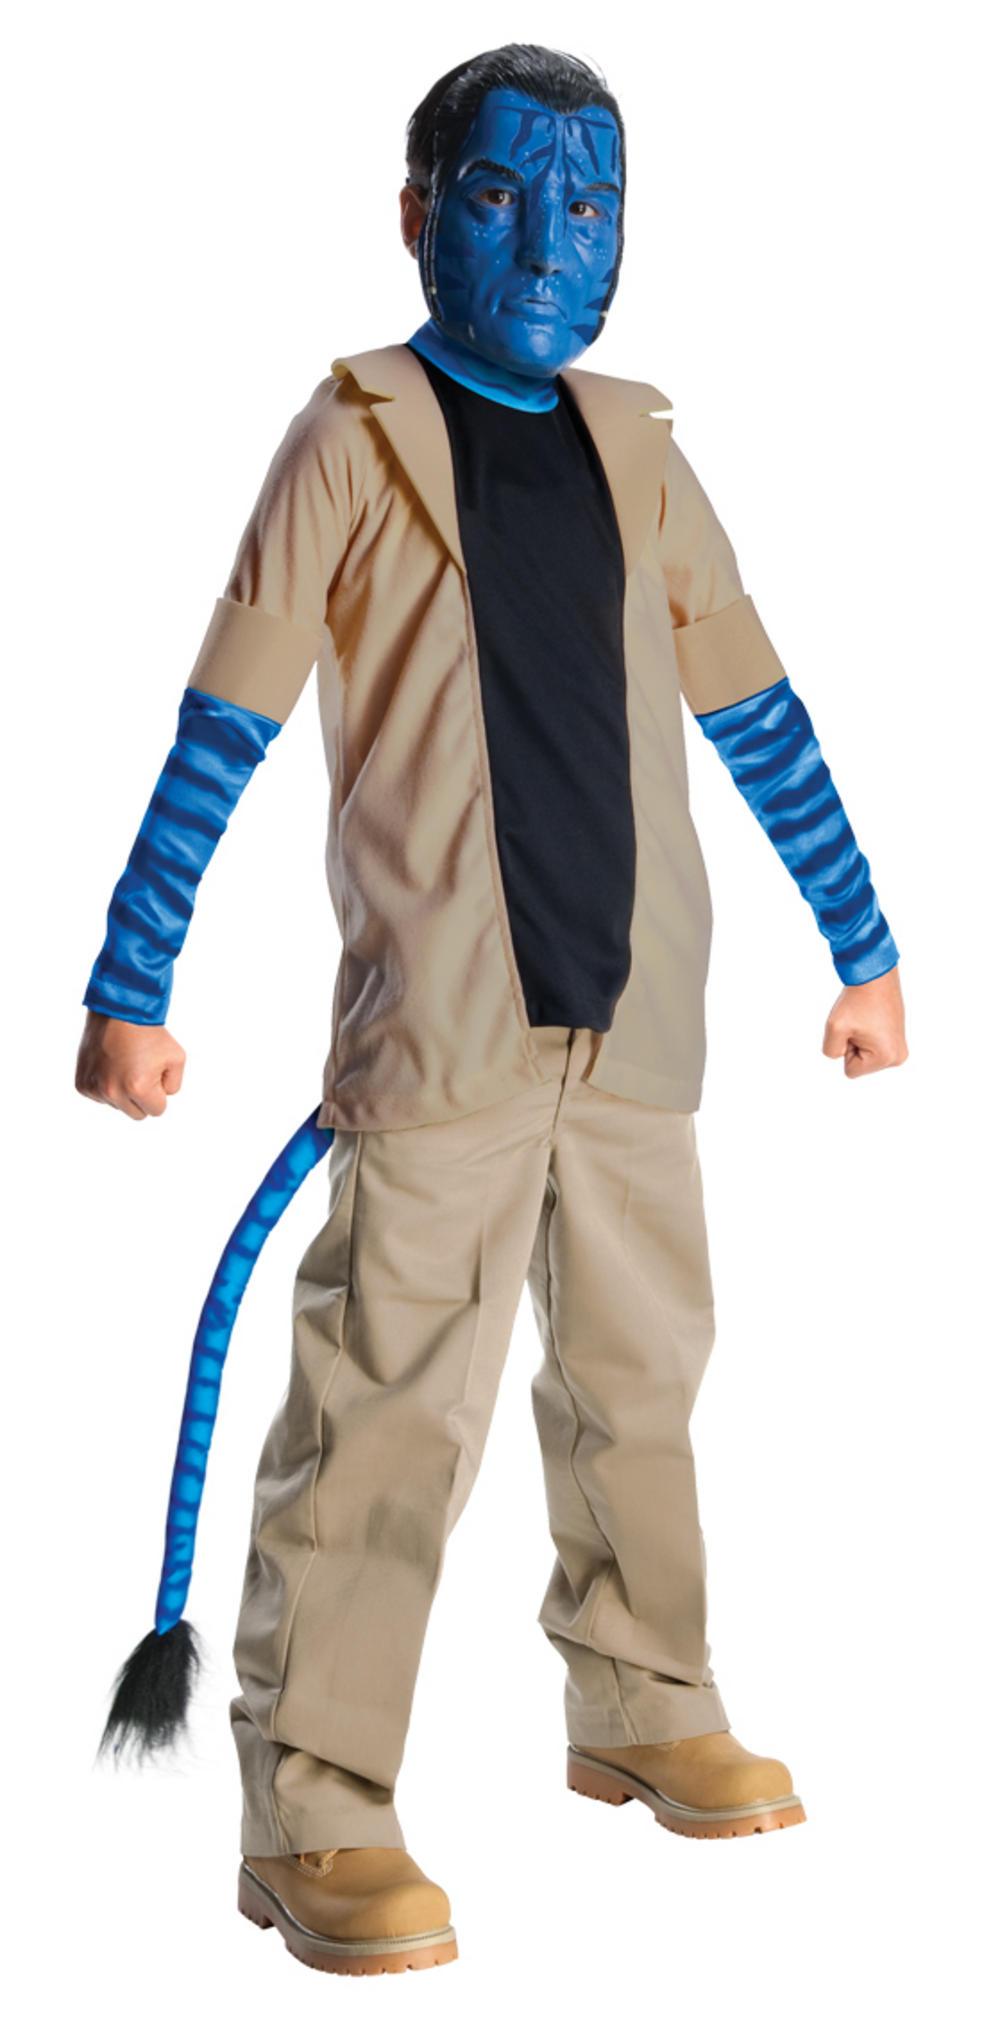 Boys Avatar Jake Sully Costume